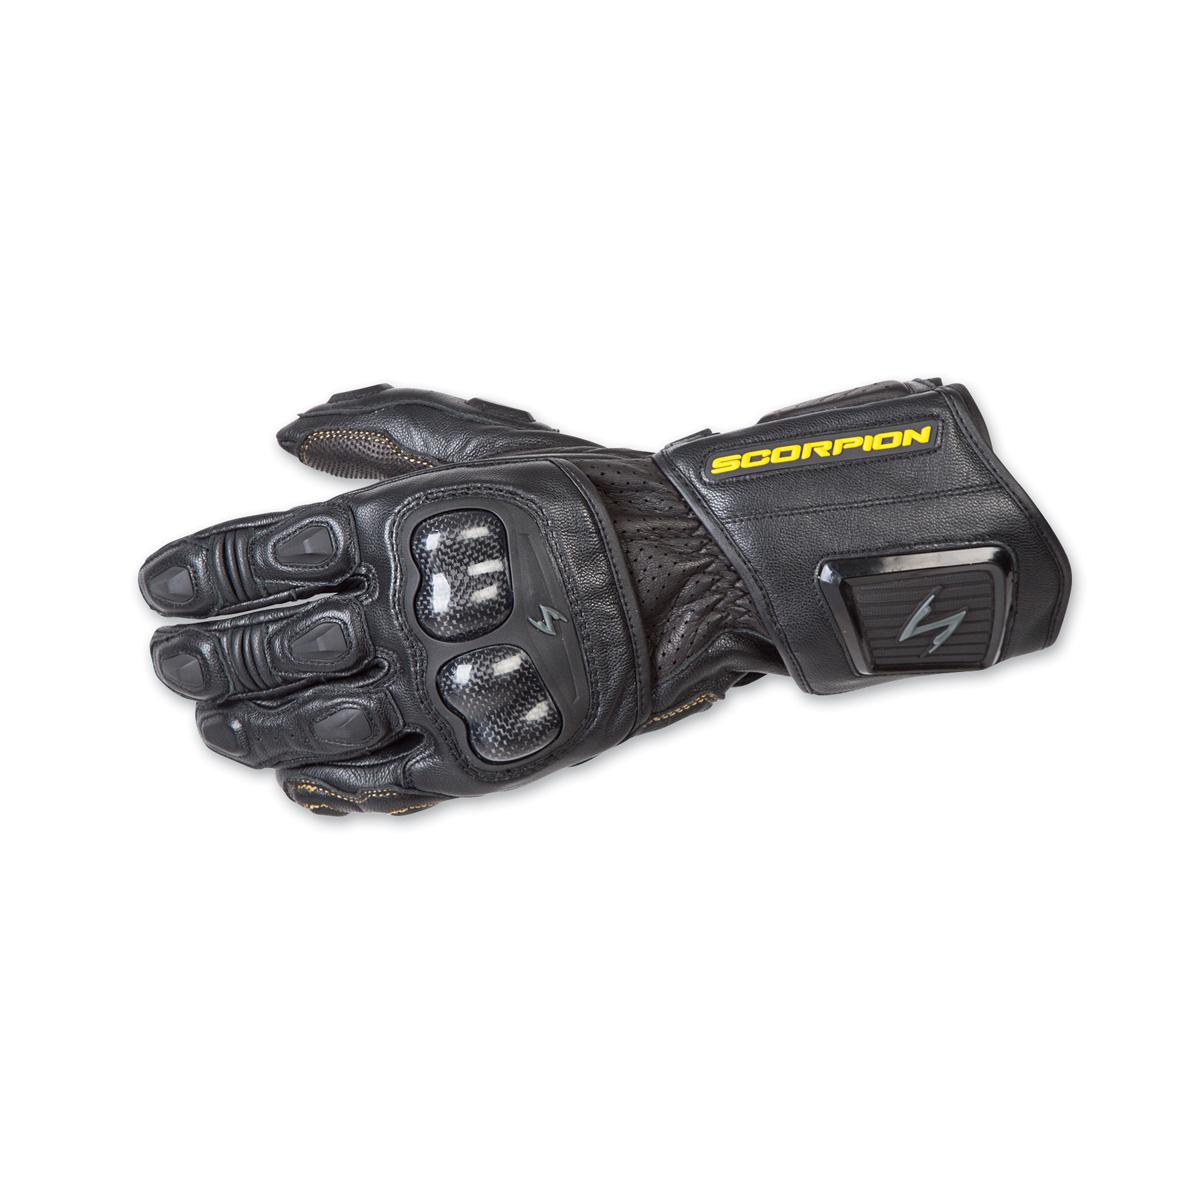 Scorpion EXO Men's SG3 MKII Black Gauntlet Gloves